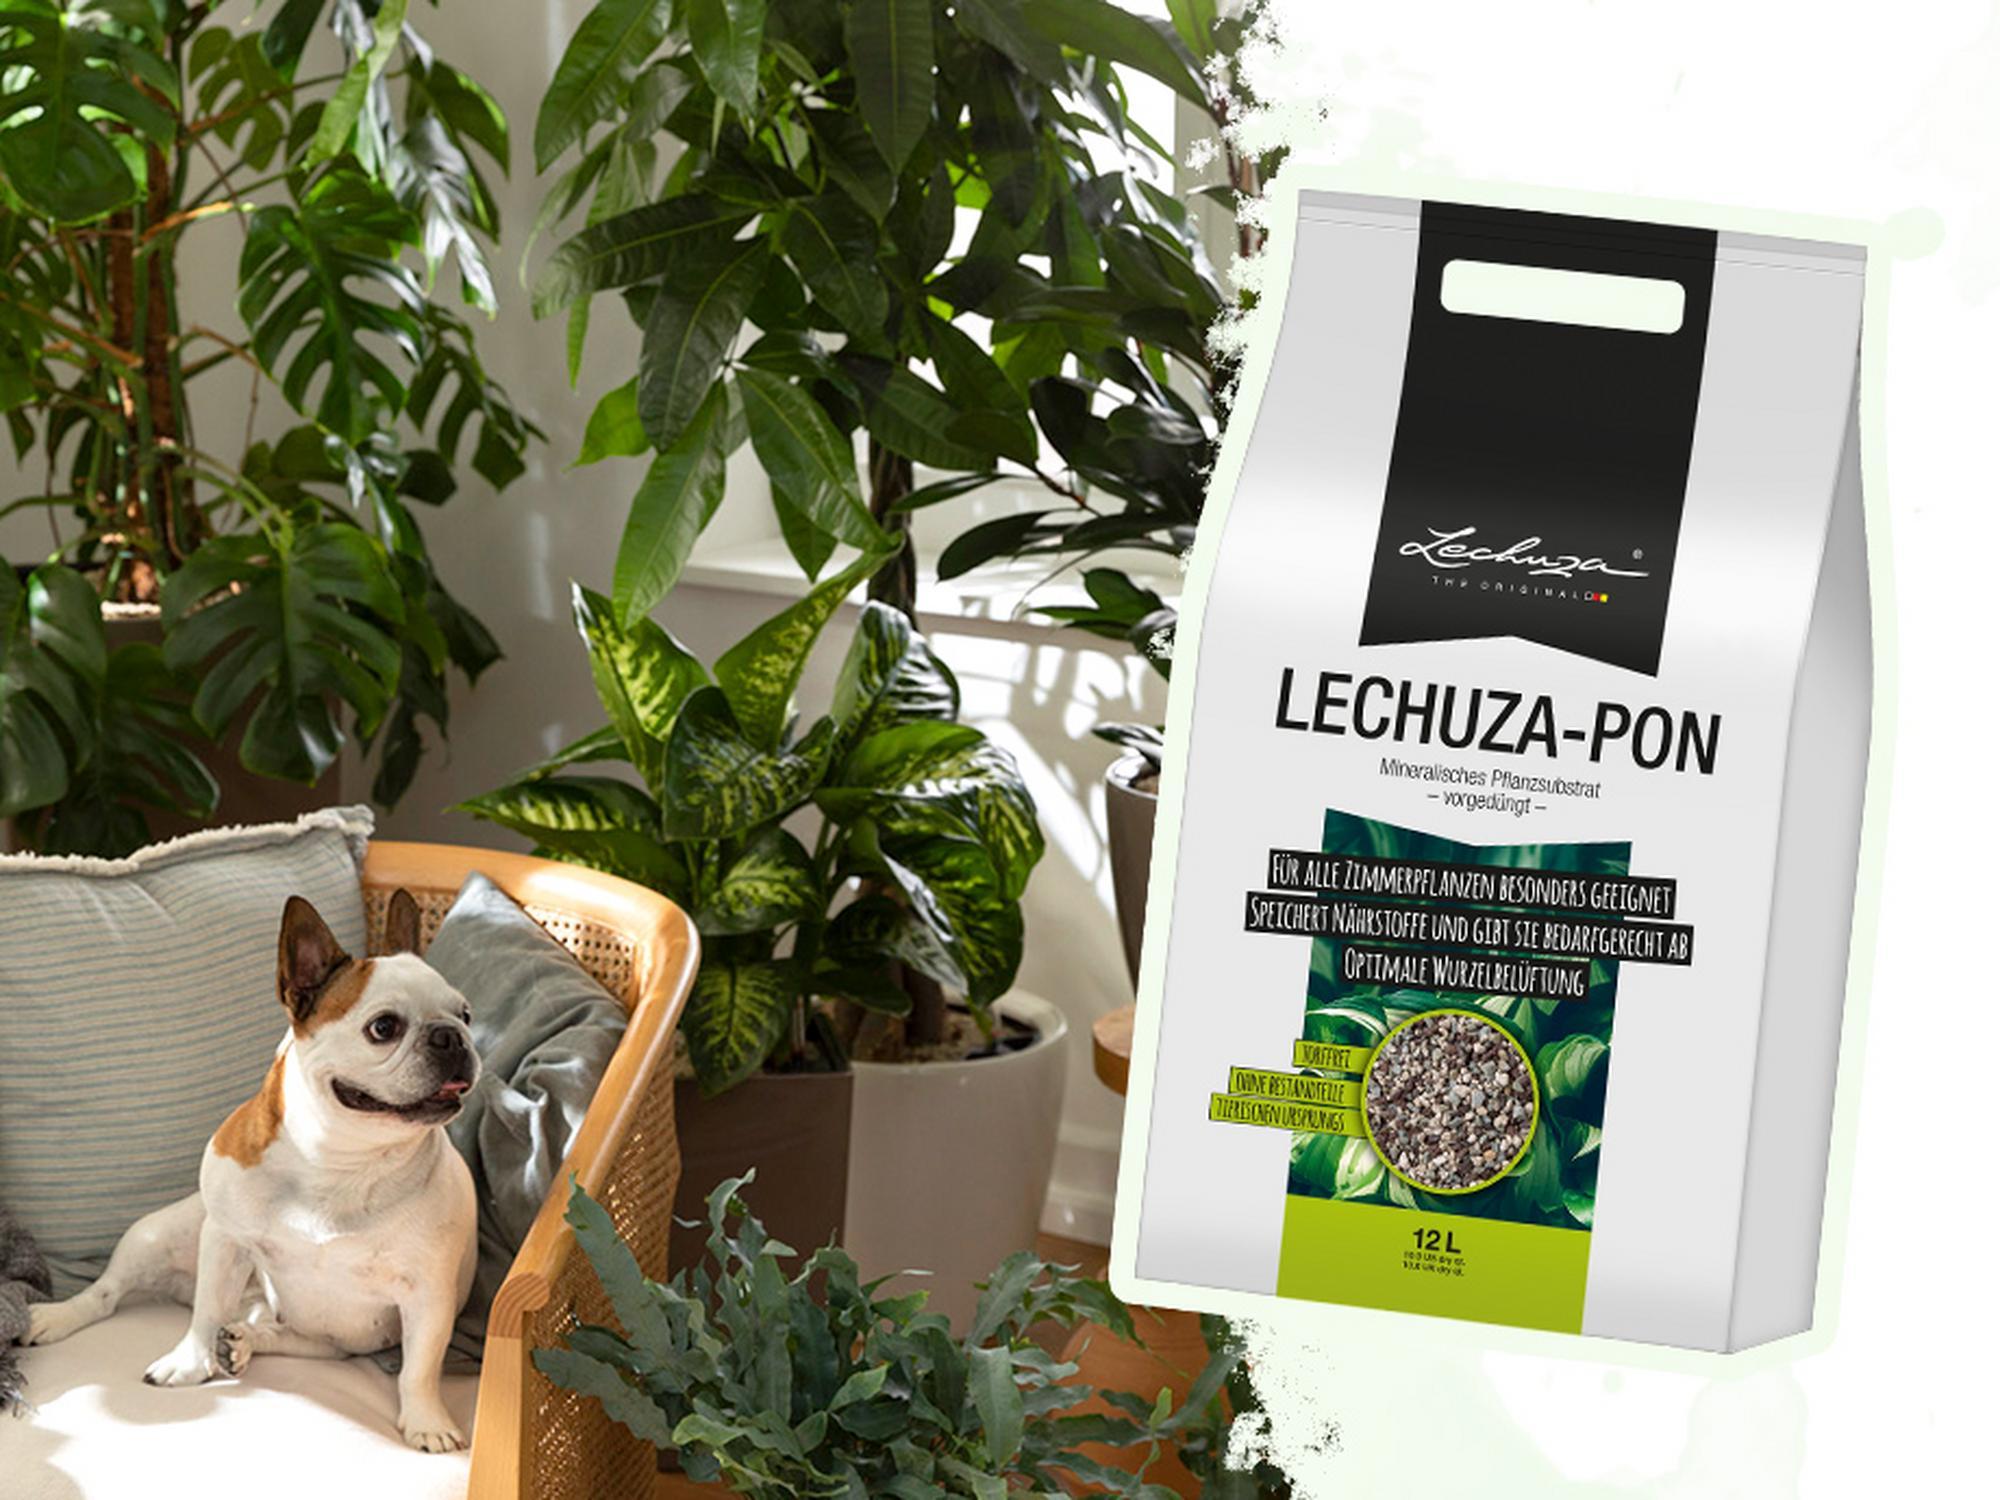 Дарим LECHUZA PON для комфорта ваших растений